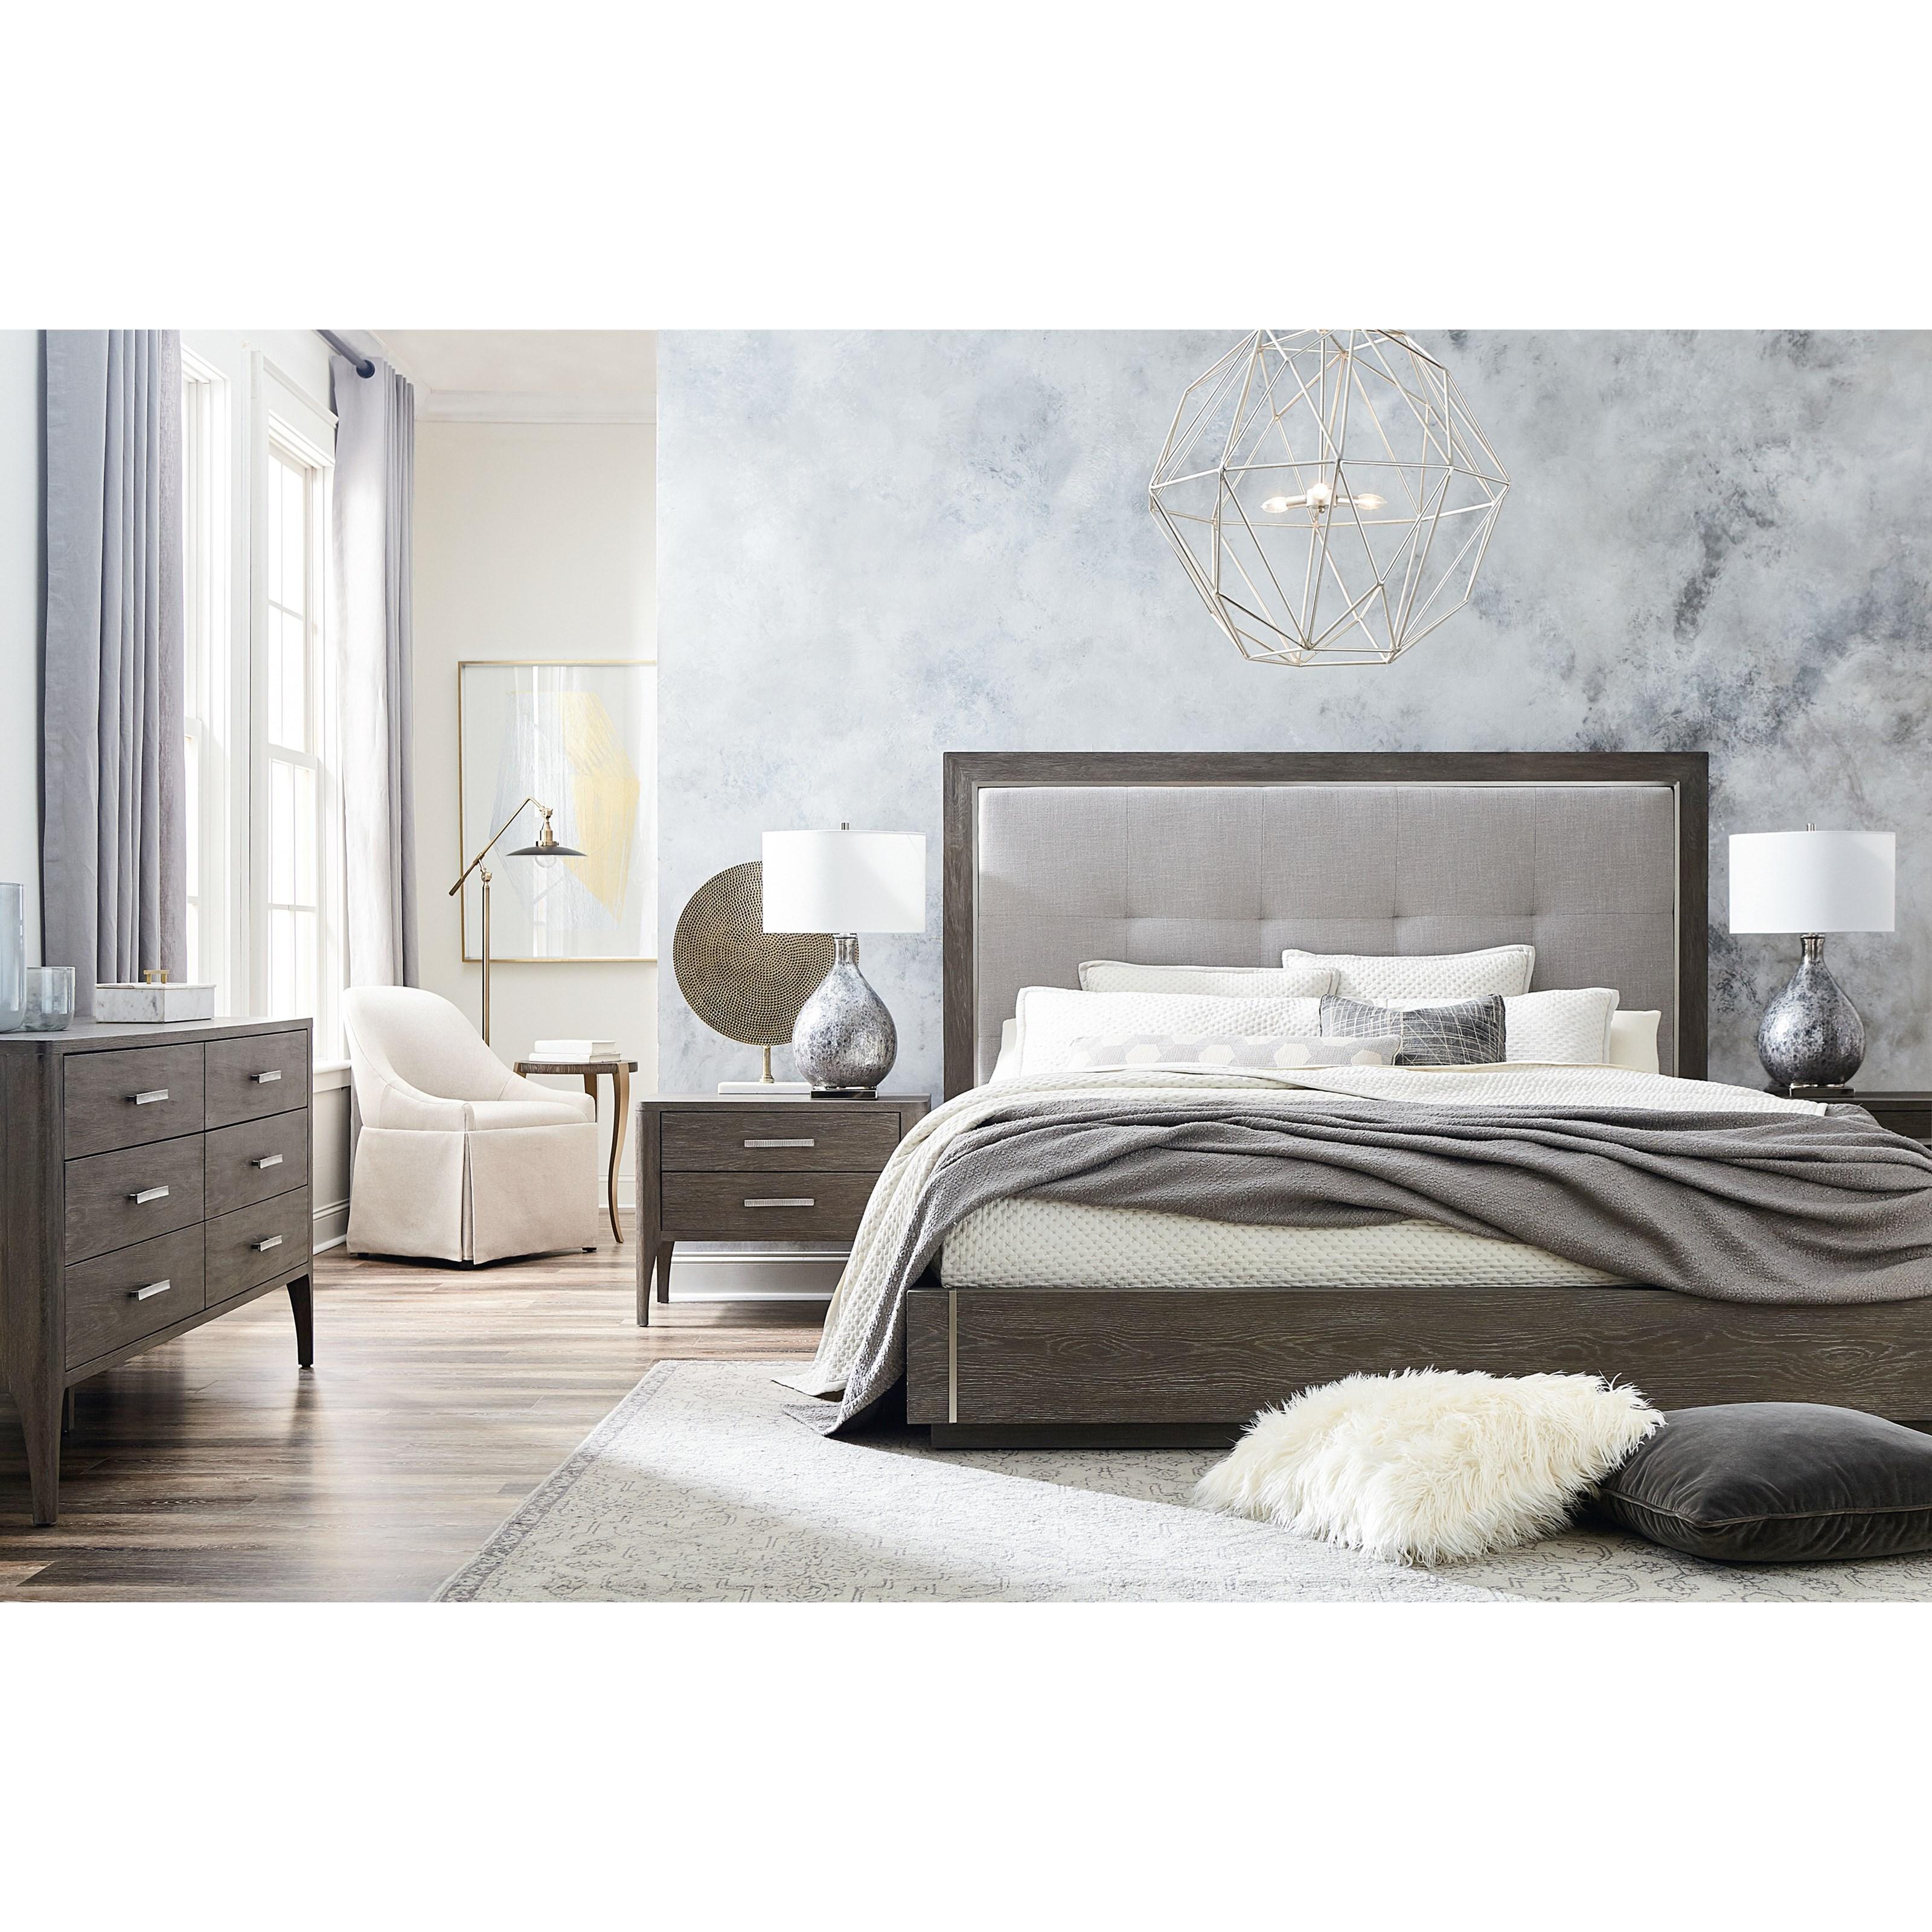 Modern - Astor and Rivoli King Bedroom Group by Bassett at Williams & Kay